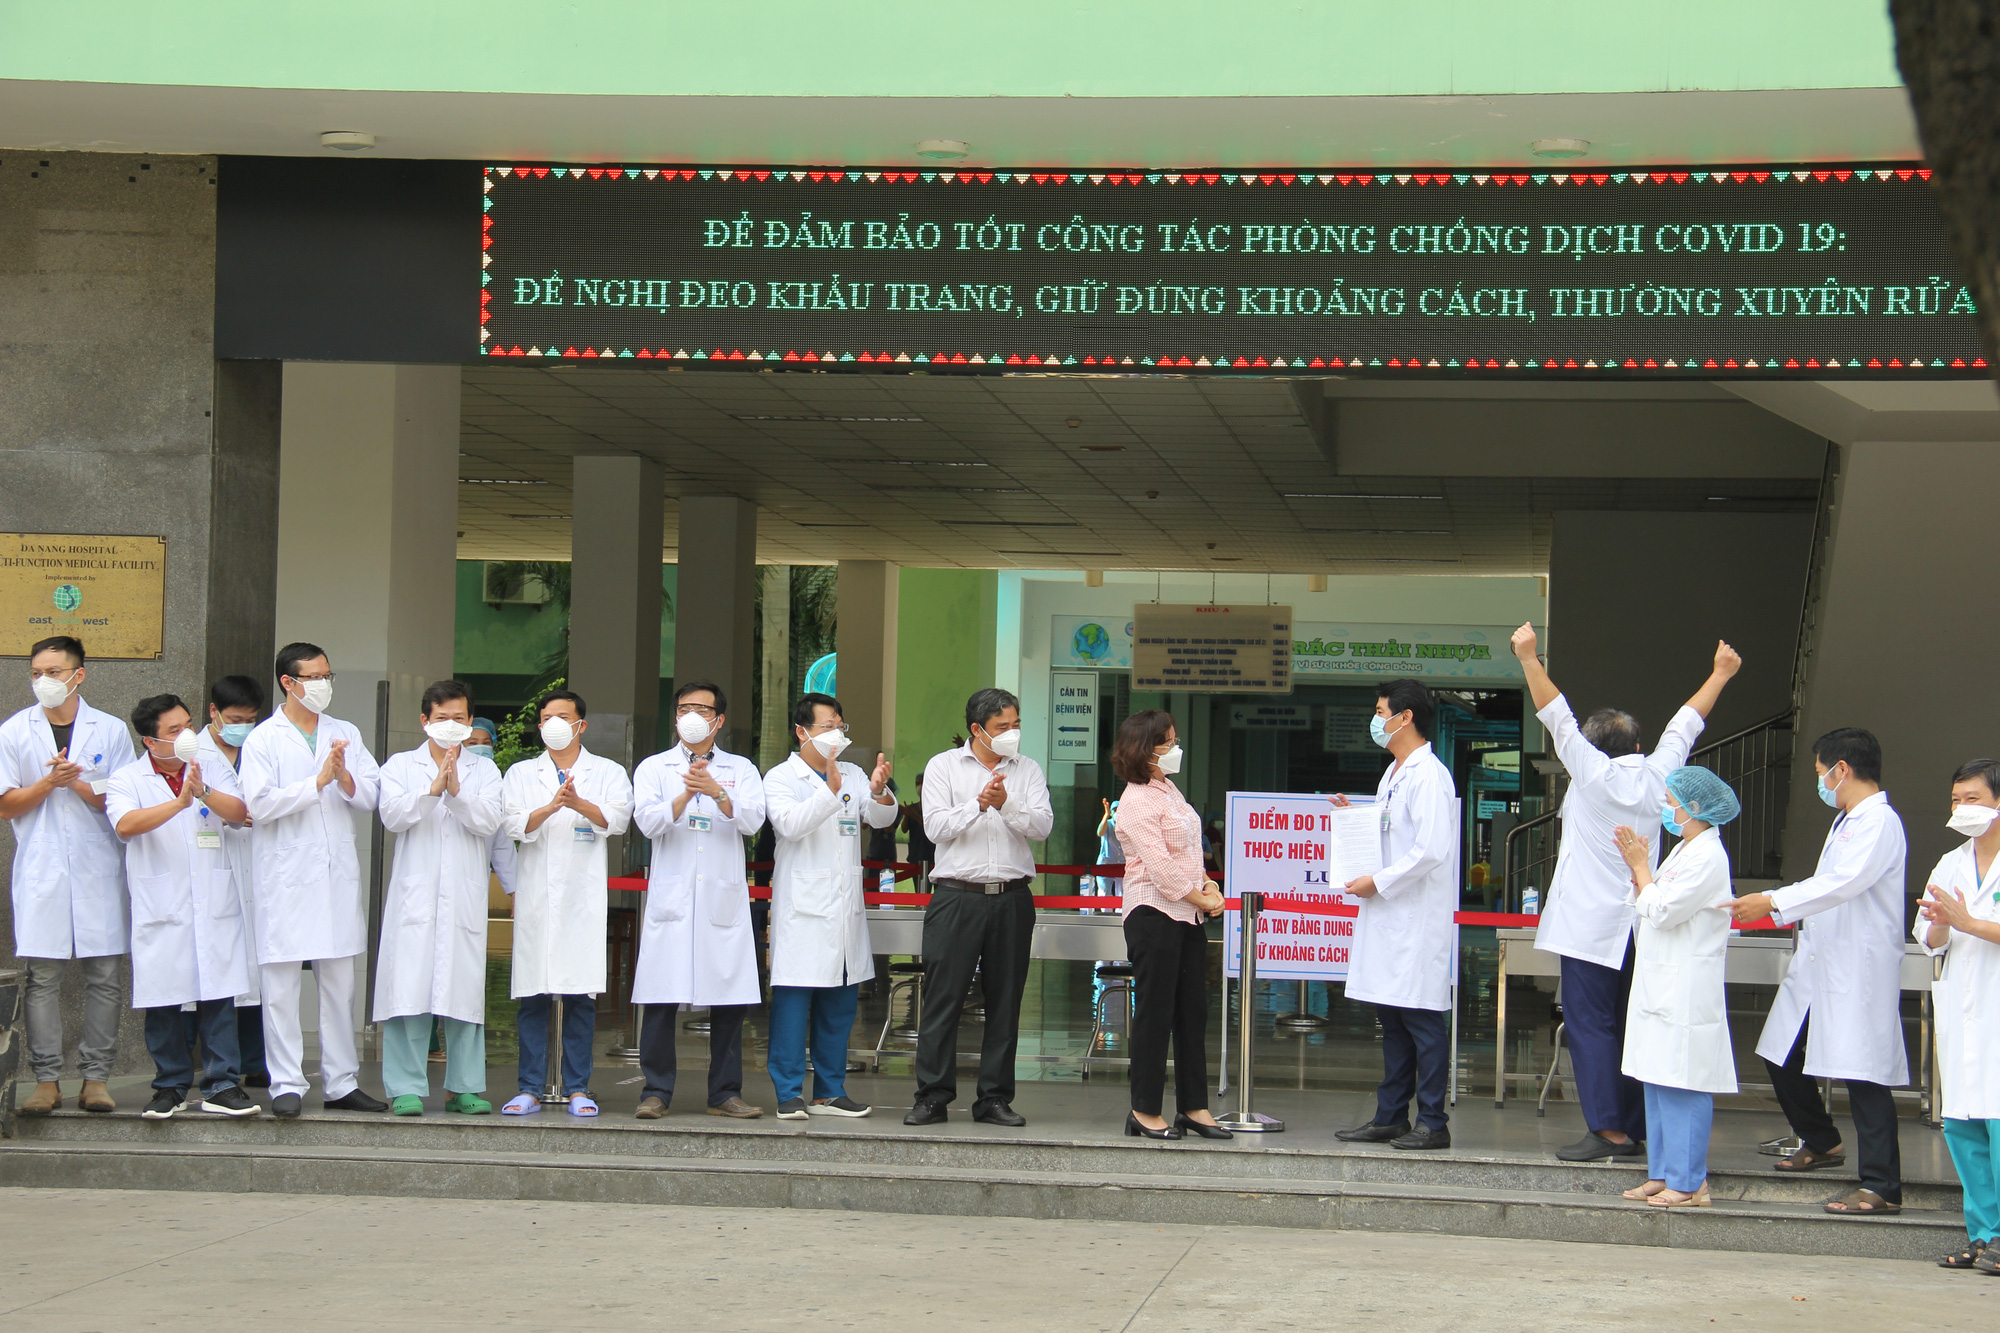 Da Nang lifts lockdown on major hospital as COVID-19 cluster under control